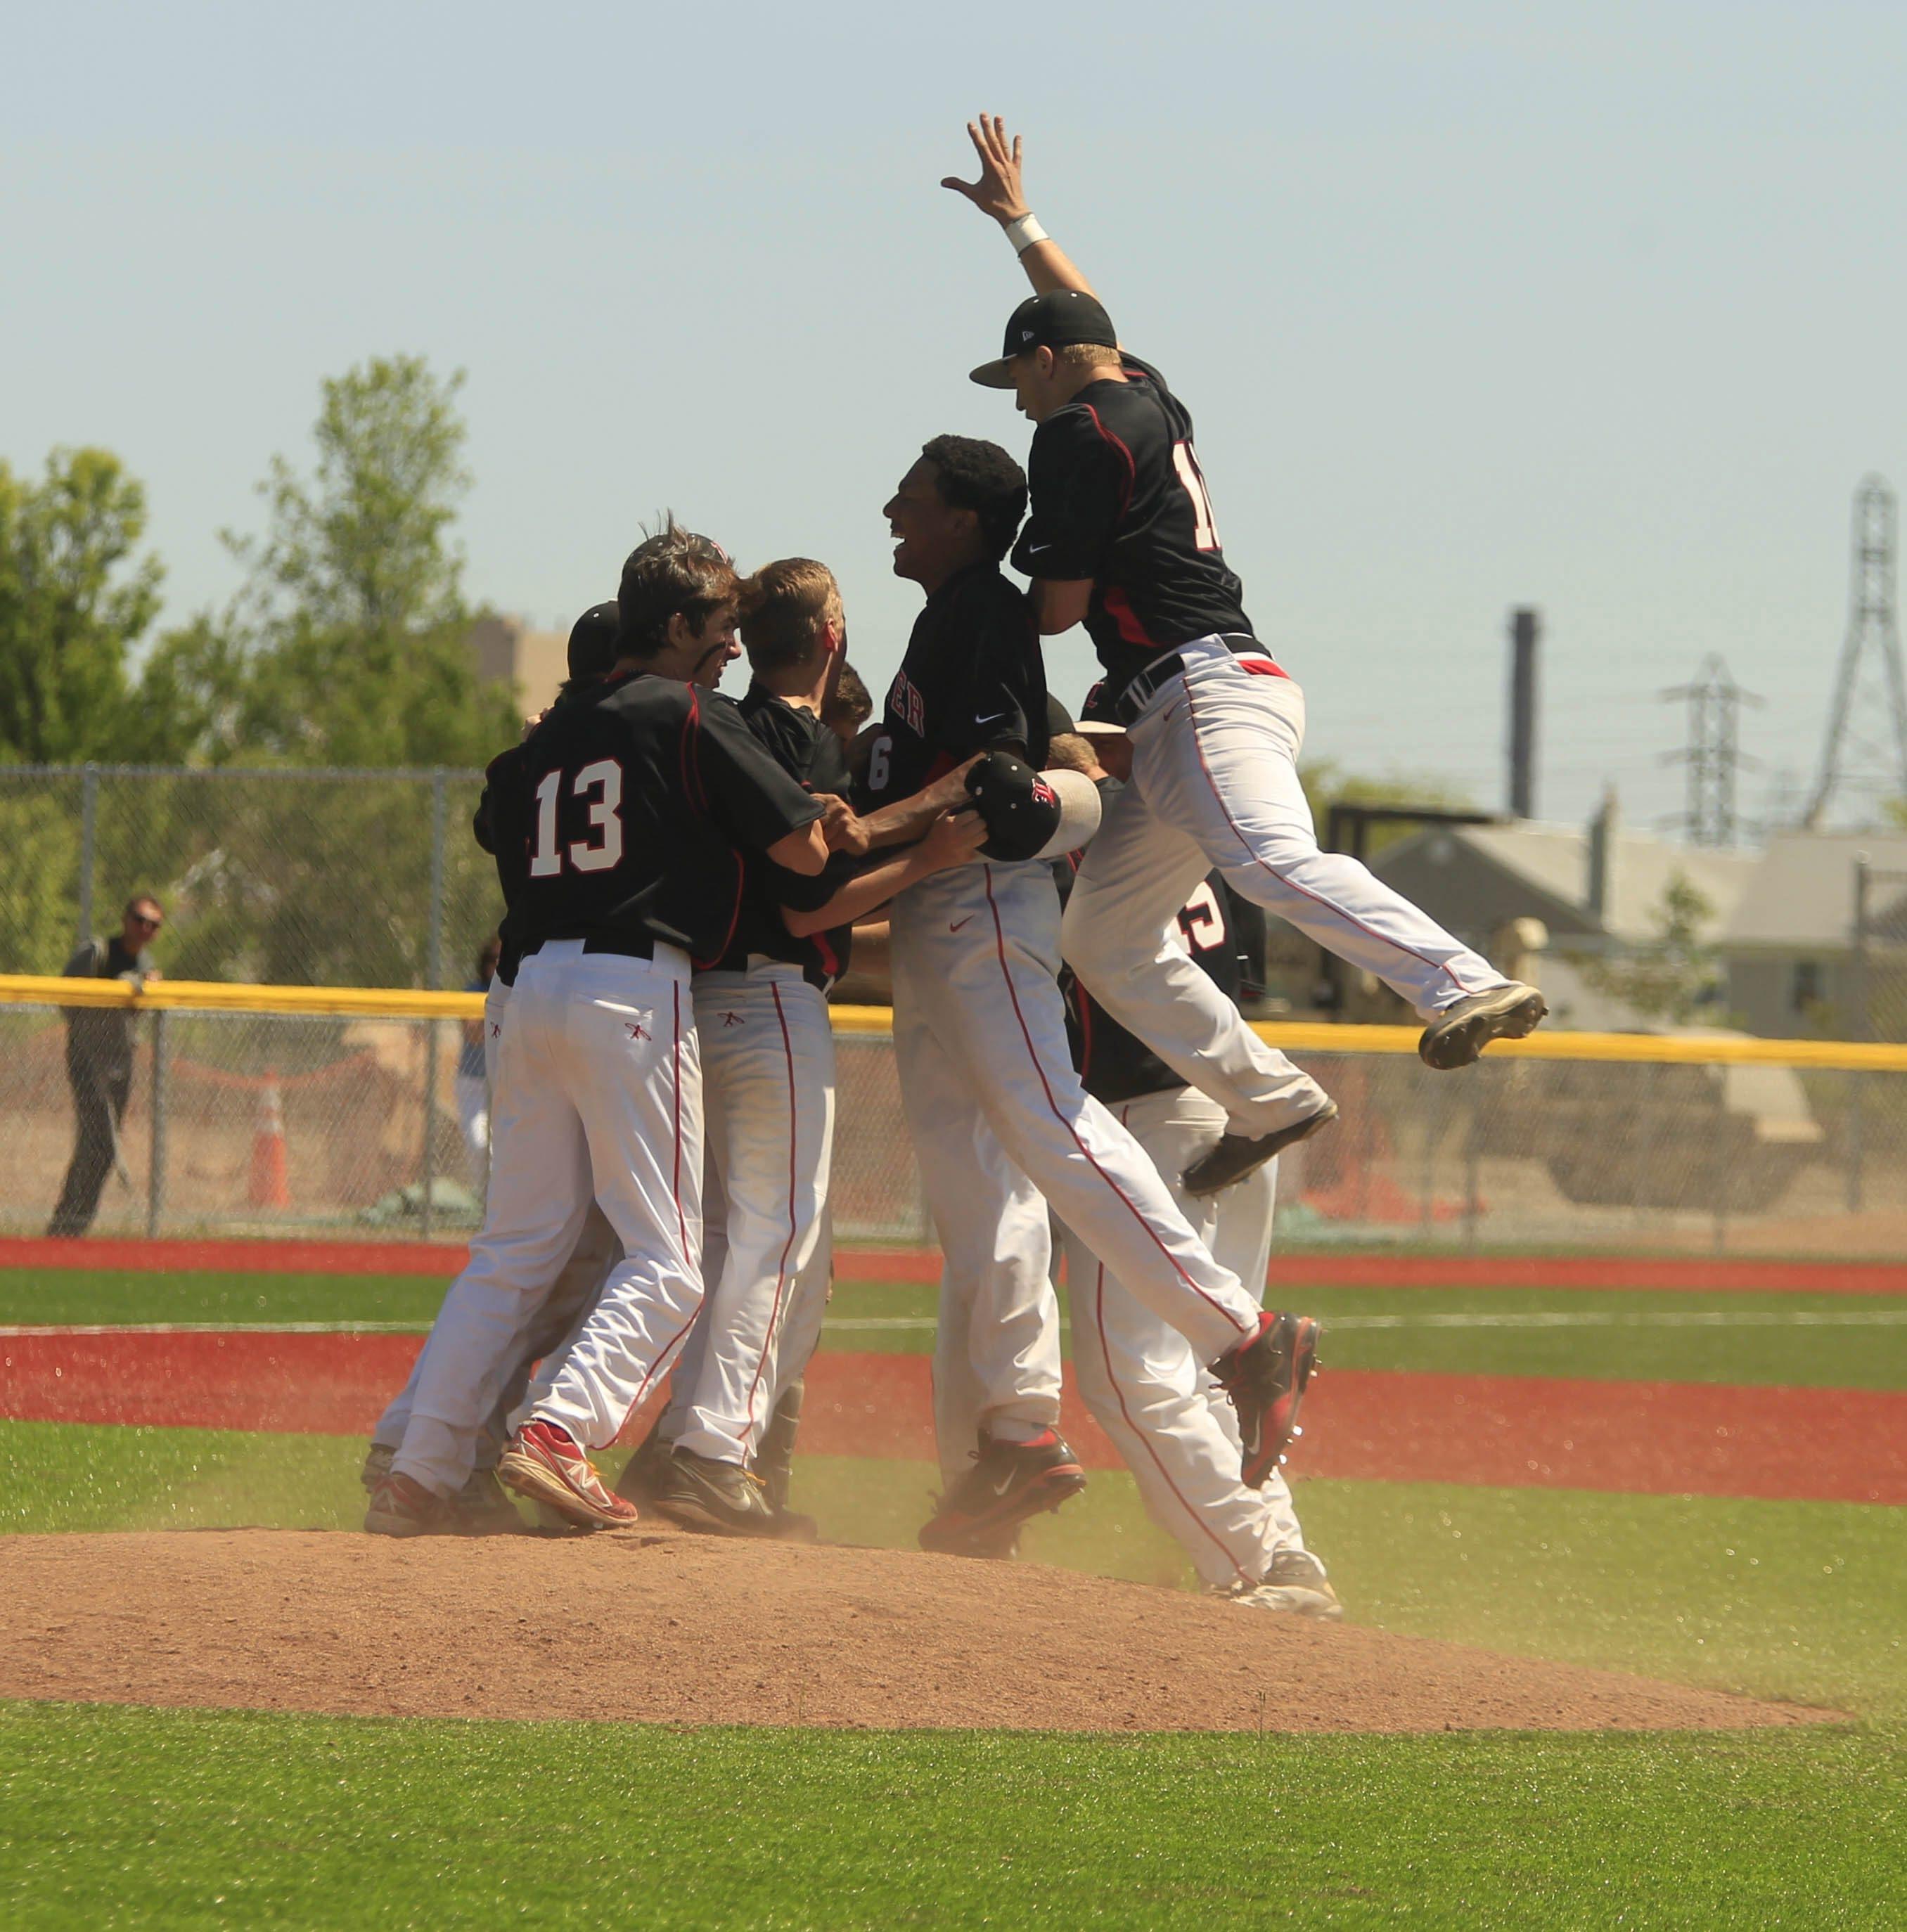 Lancaster's celebrates its 4-3 win over Orchard Park at Niagara Falls High School.